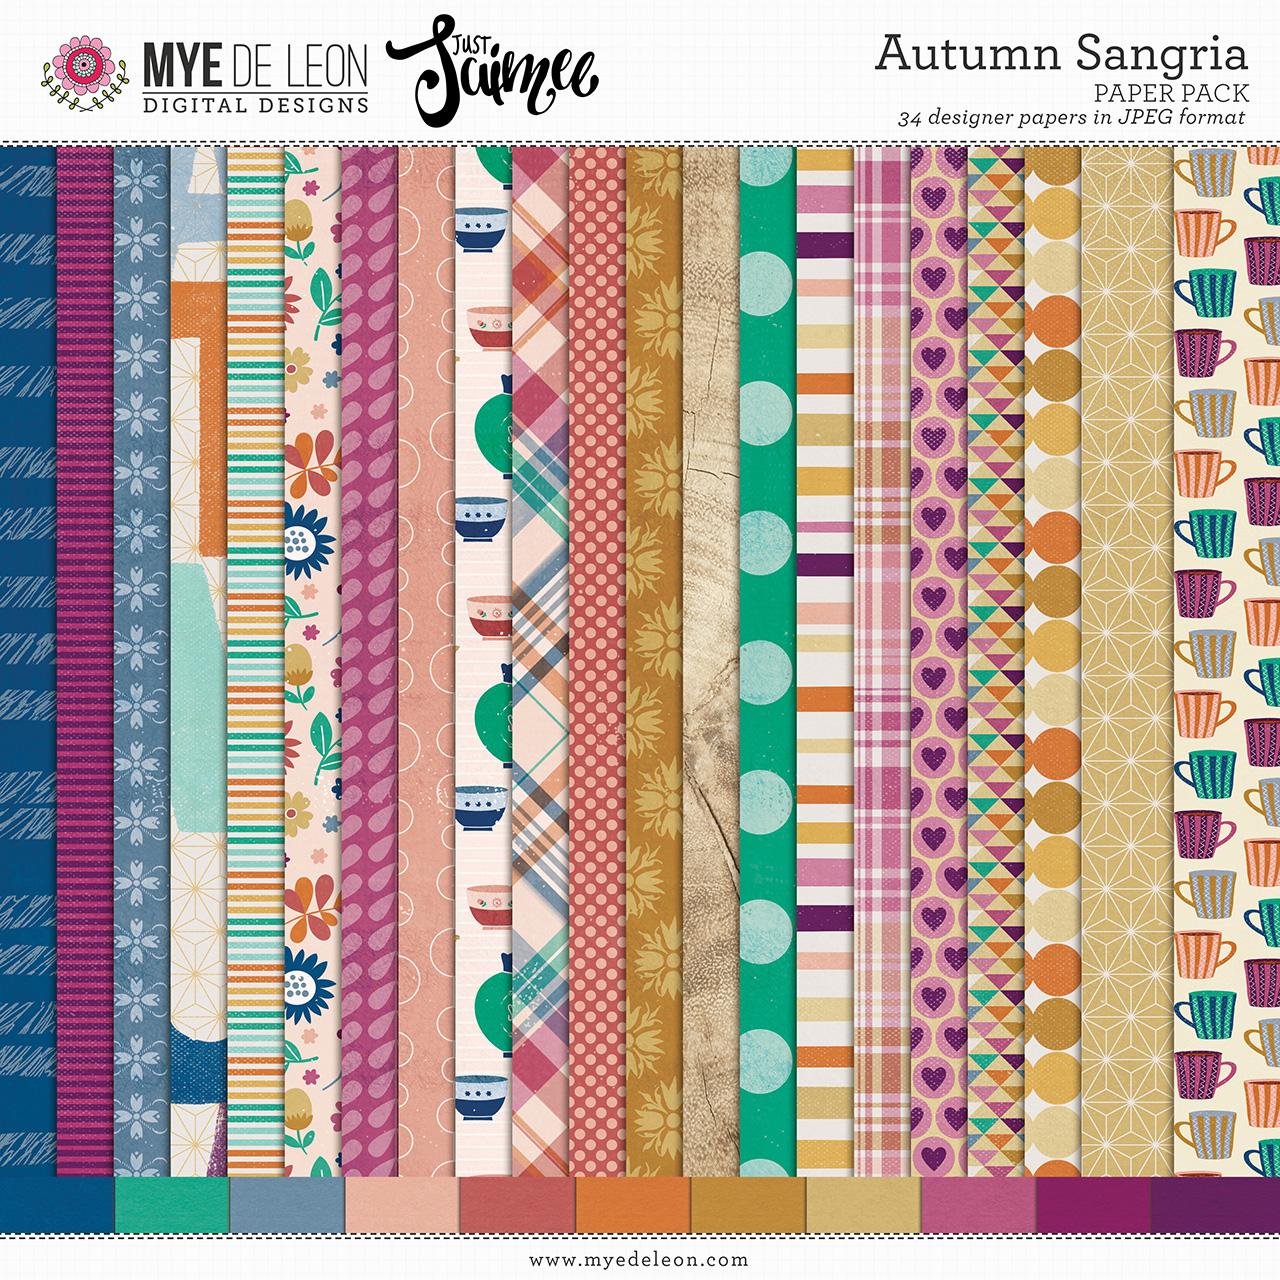 Autumn Sangria | Papers